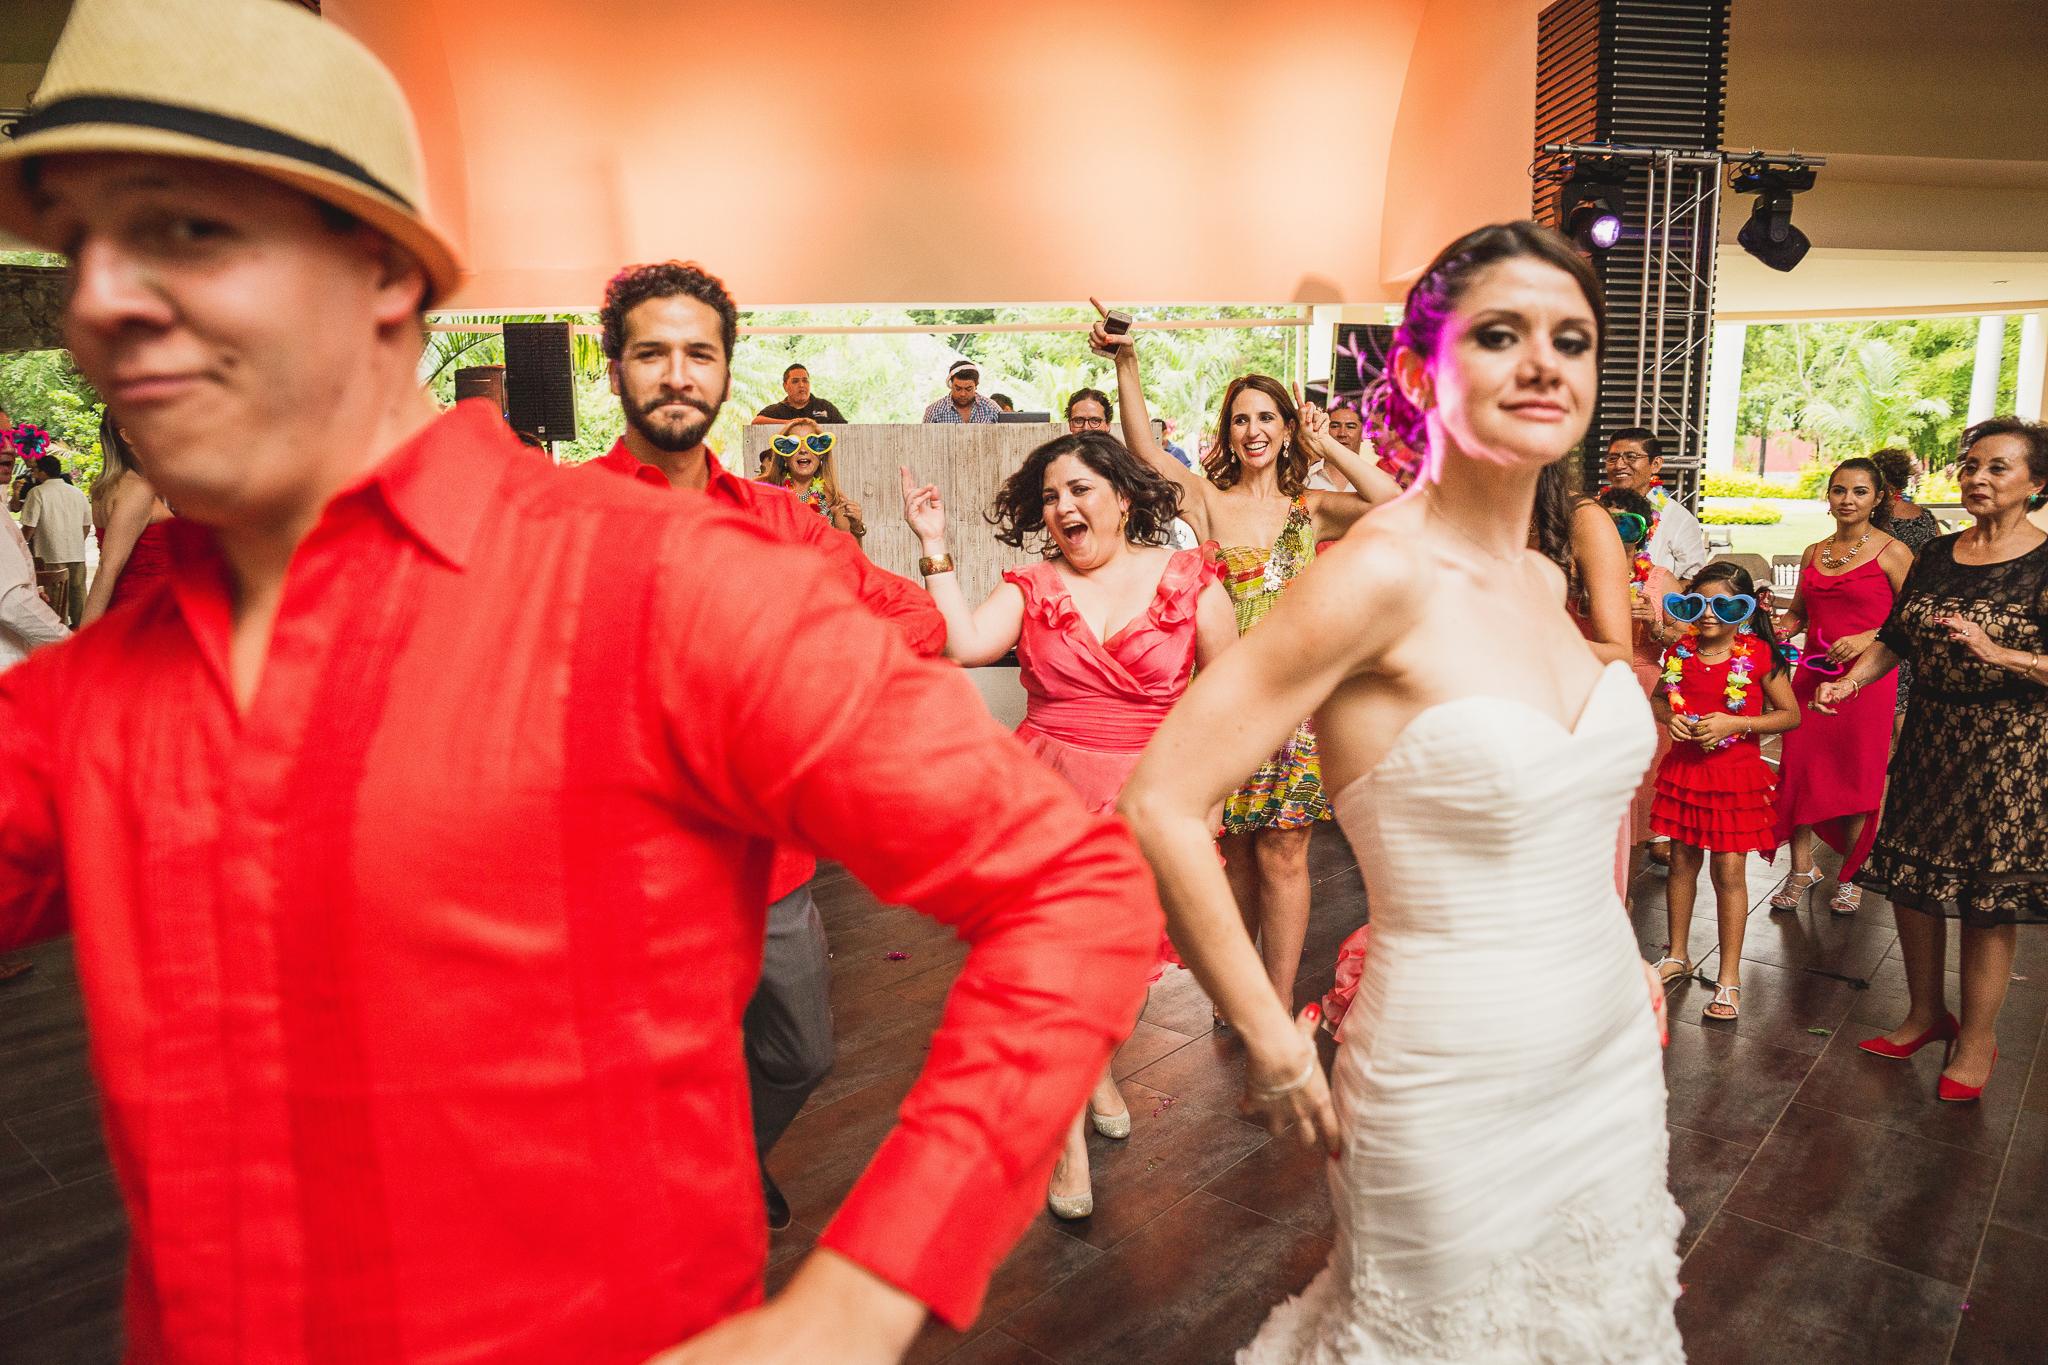 wedding-photography-mexico-quinta-rubelinas-2.jpg